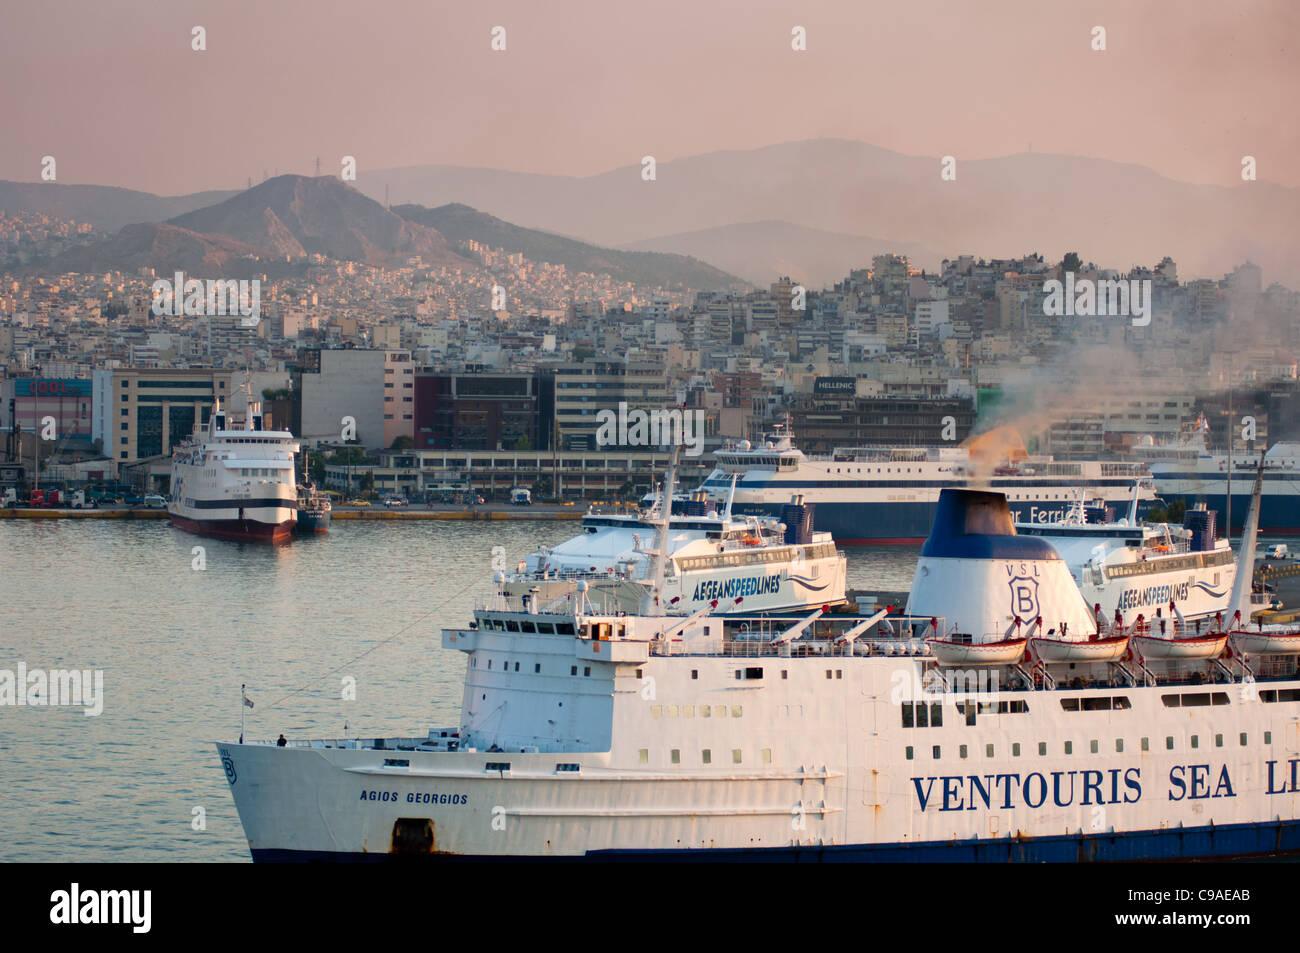 Piraeus, Athen's port bustling with ships. Greece. - Stock Image